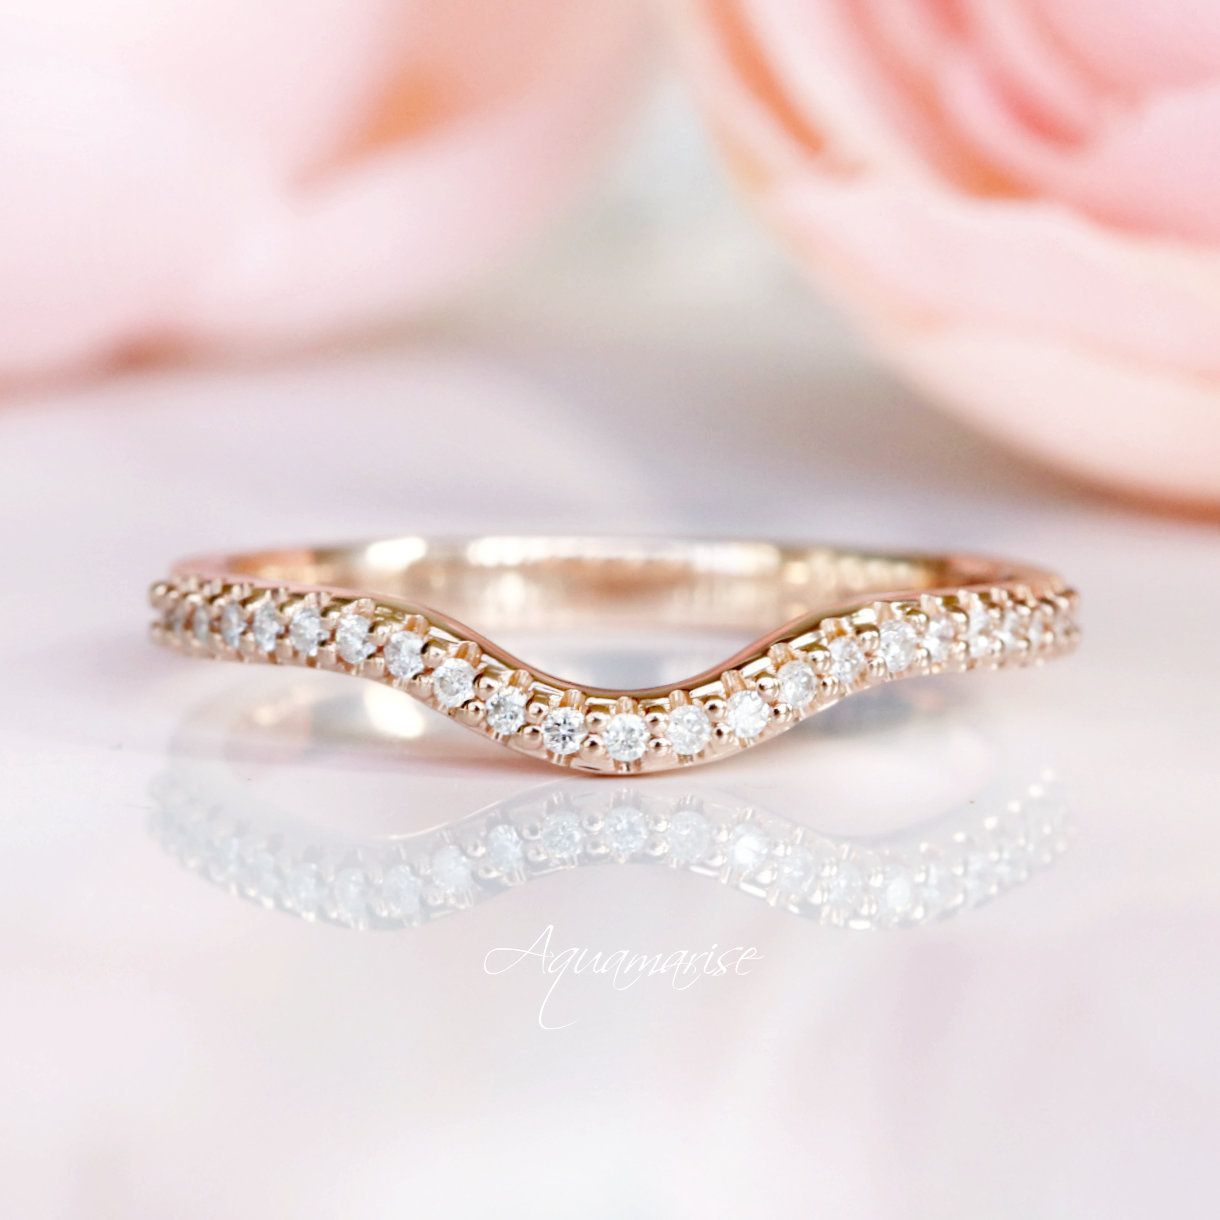 18k rose gold curved wedding band